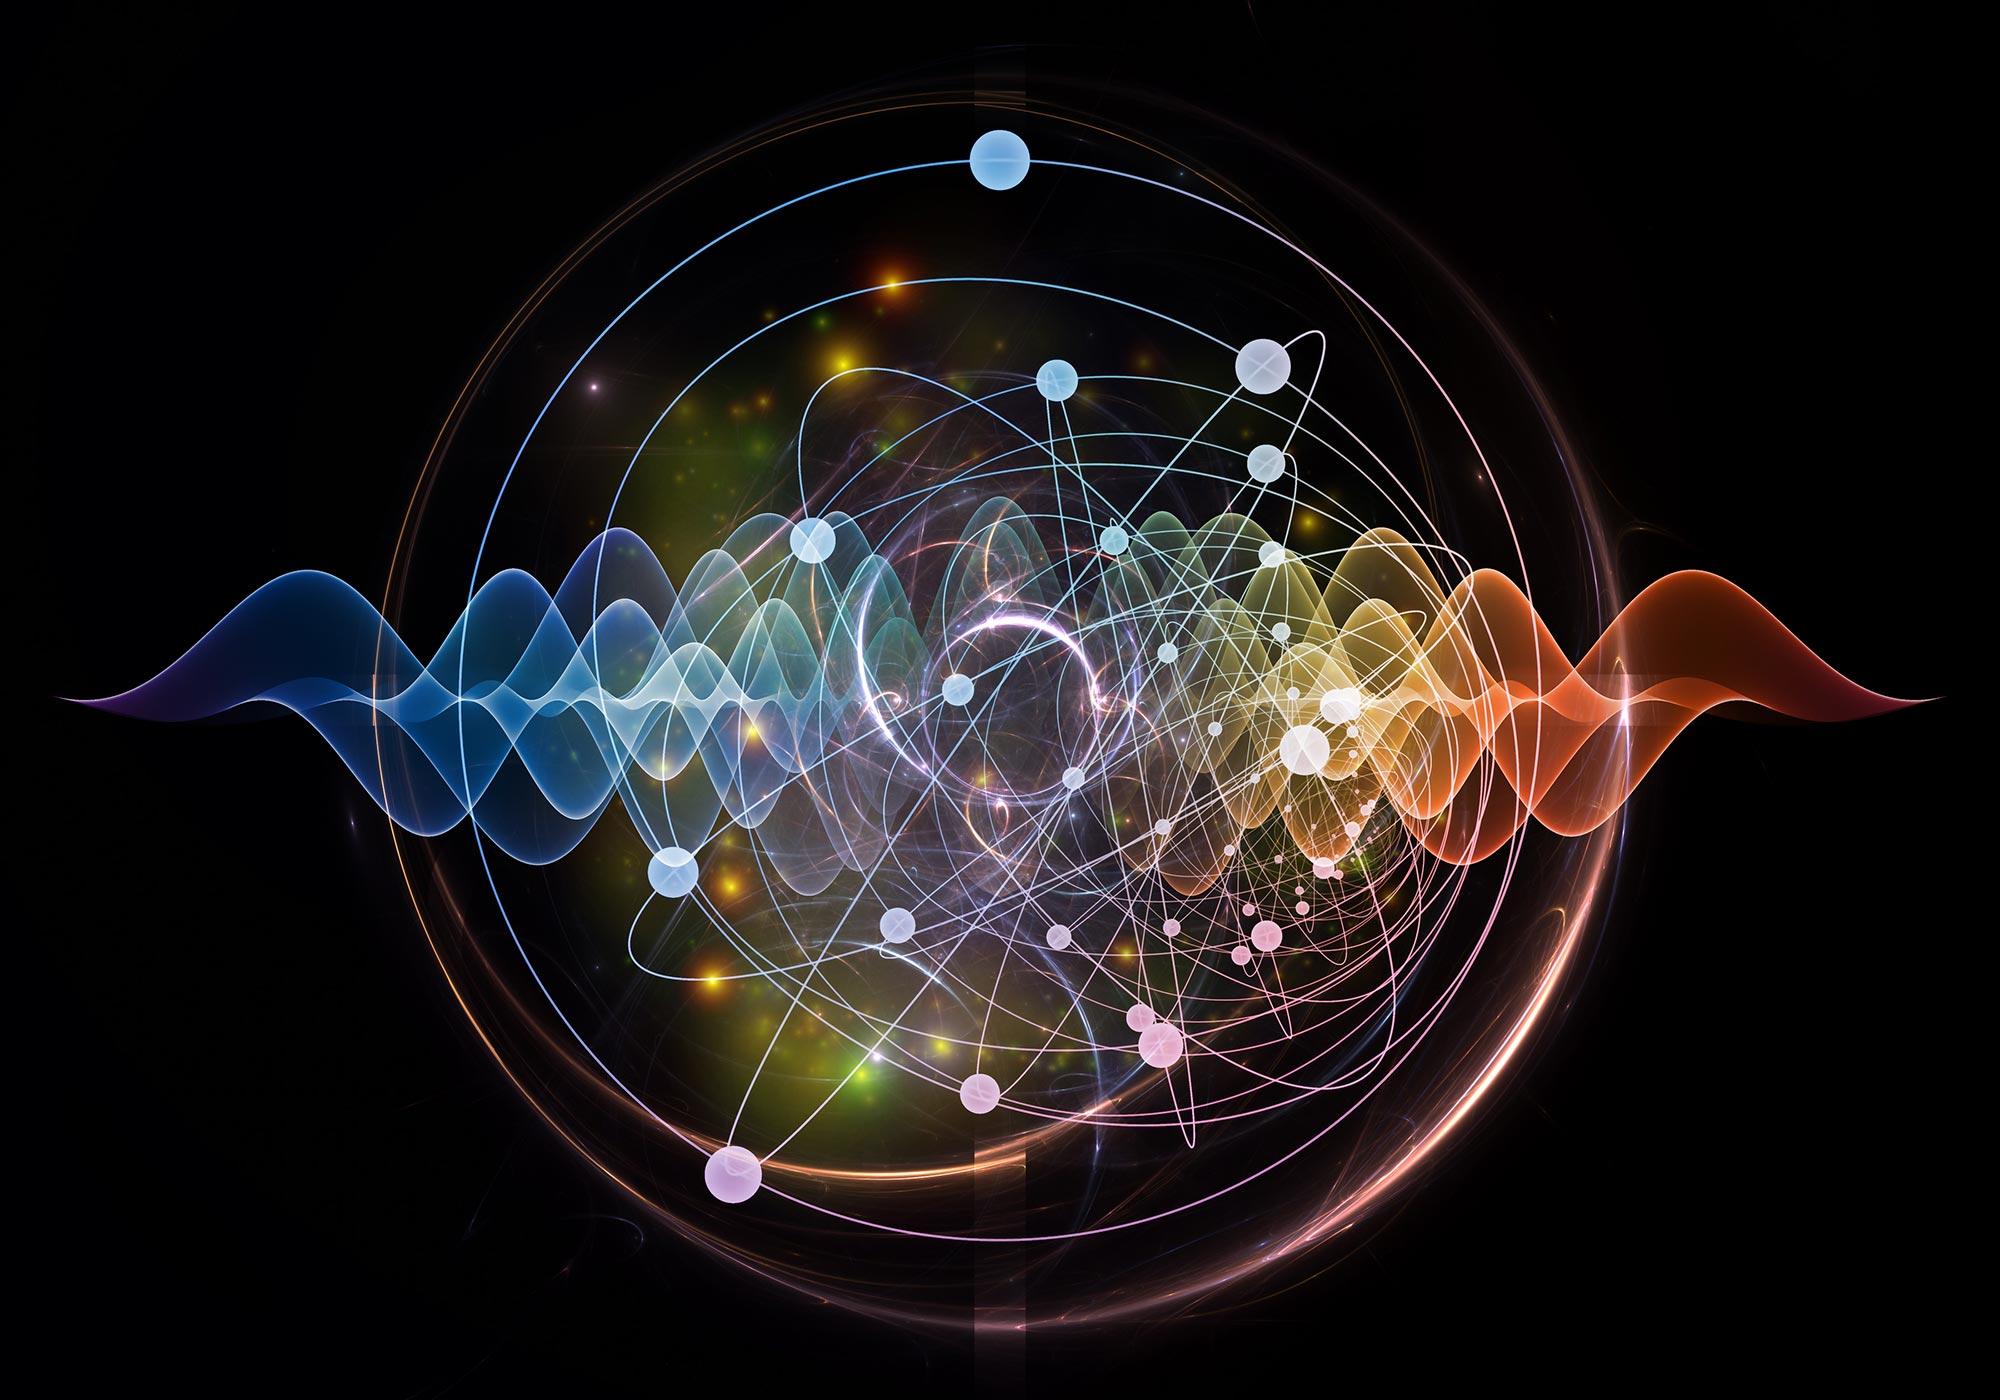 Física Quântica: um novo jeito de enxergar as leis naturais